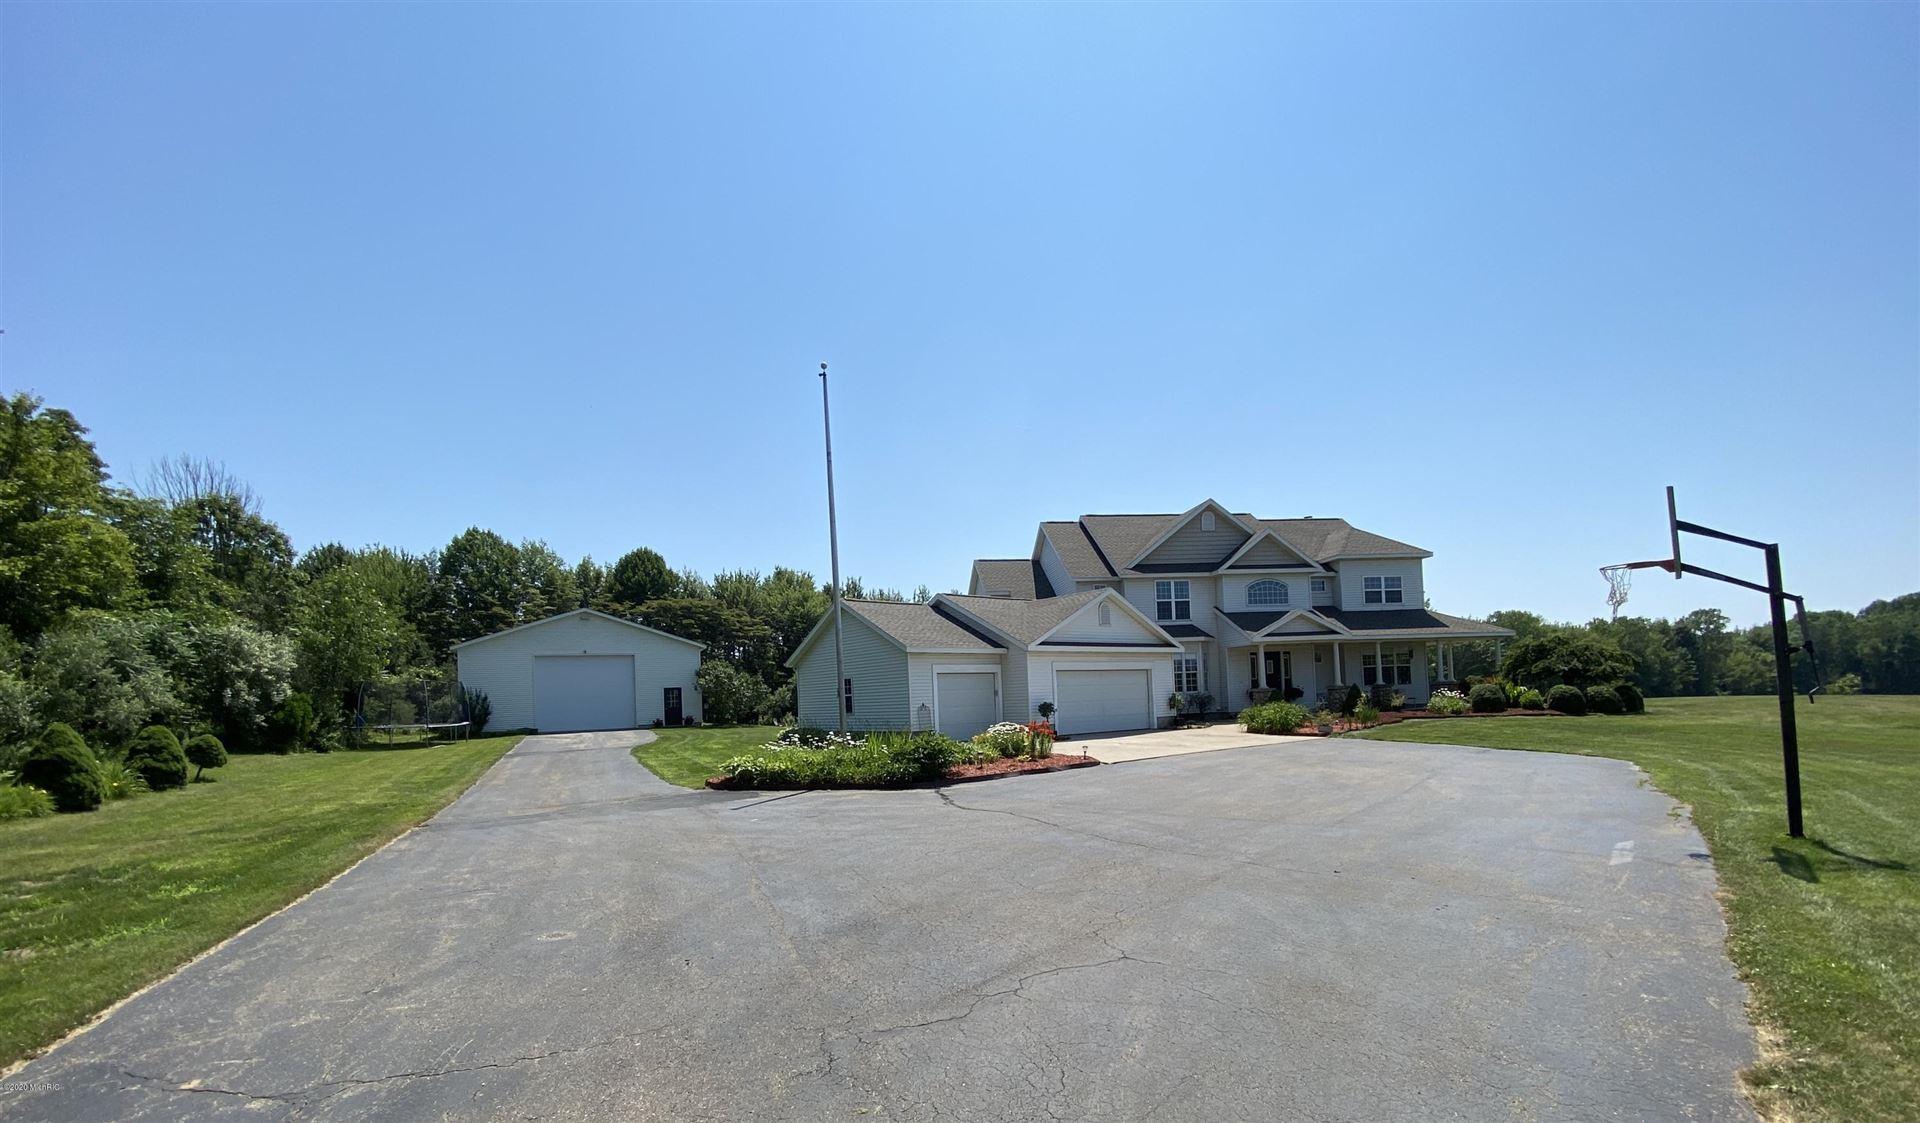 4356 Meadow Lane, Holland, MI 49423 - #: 20018317